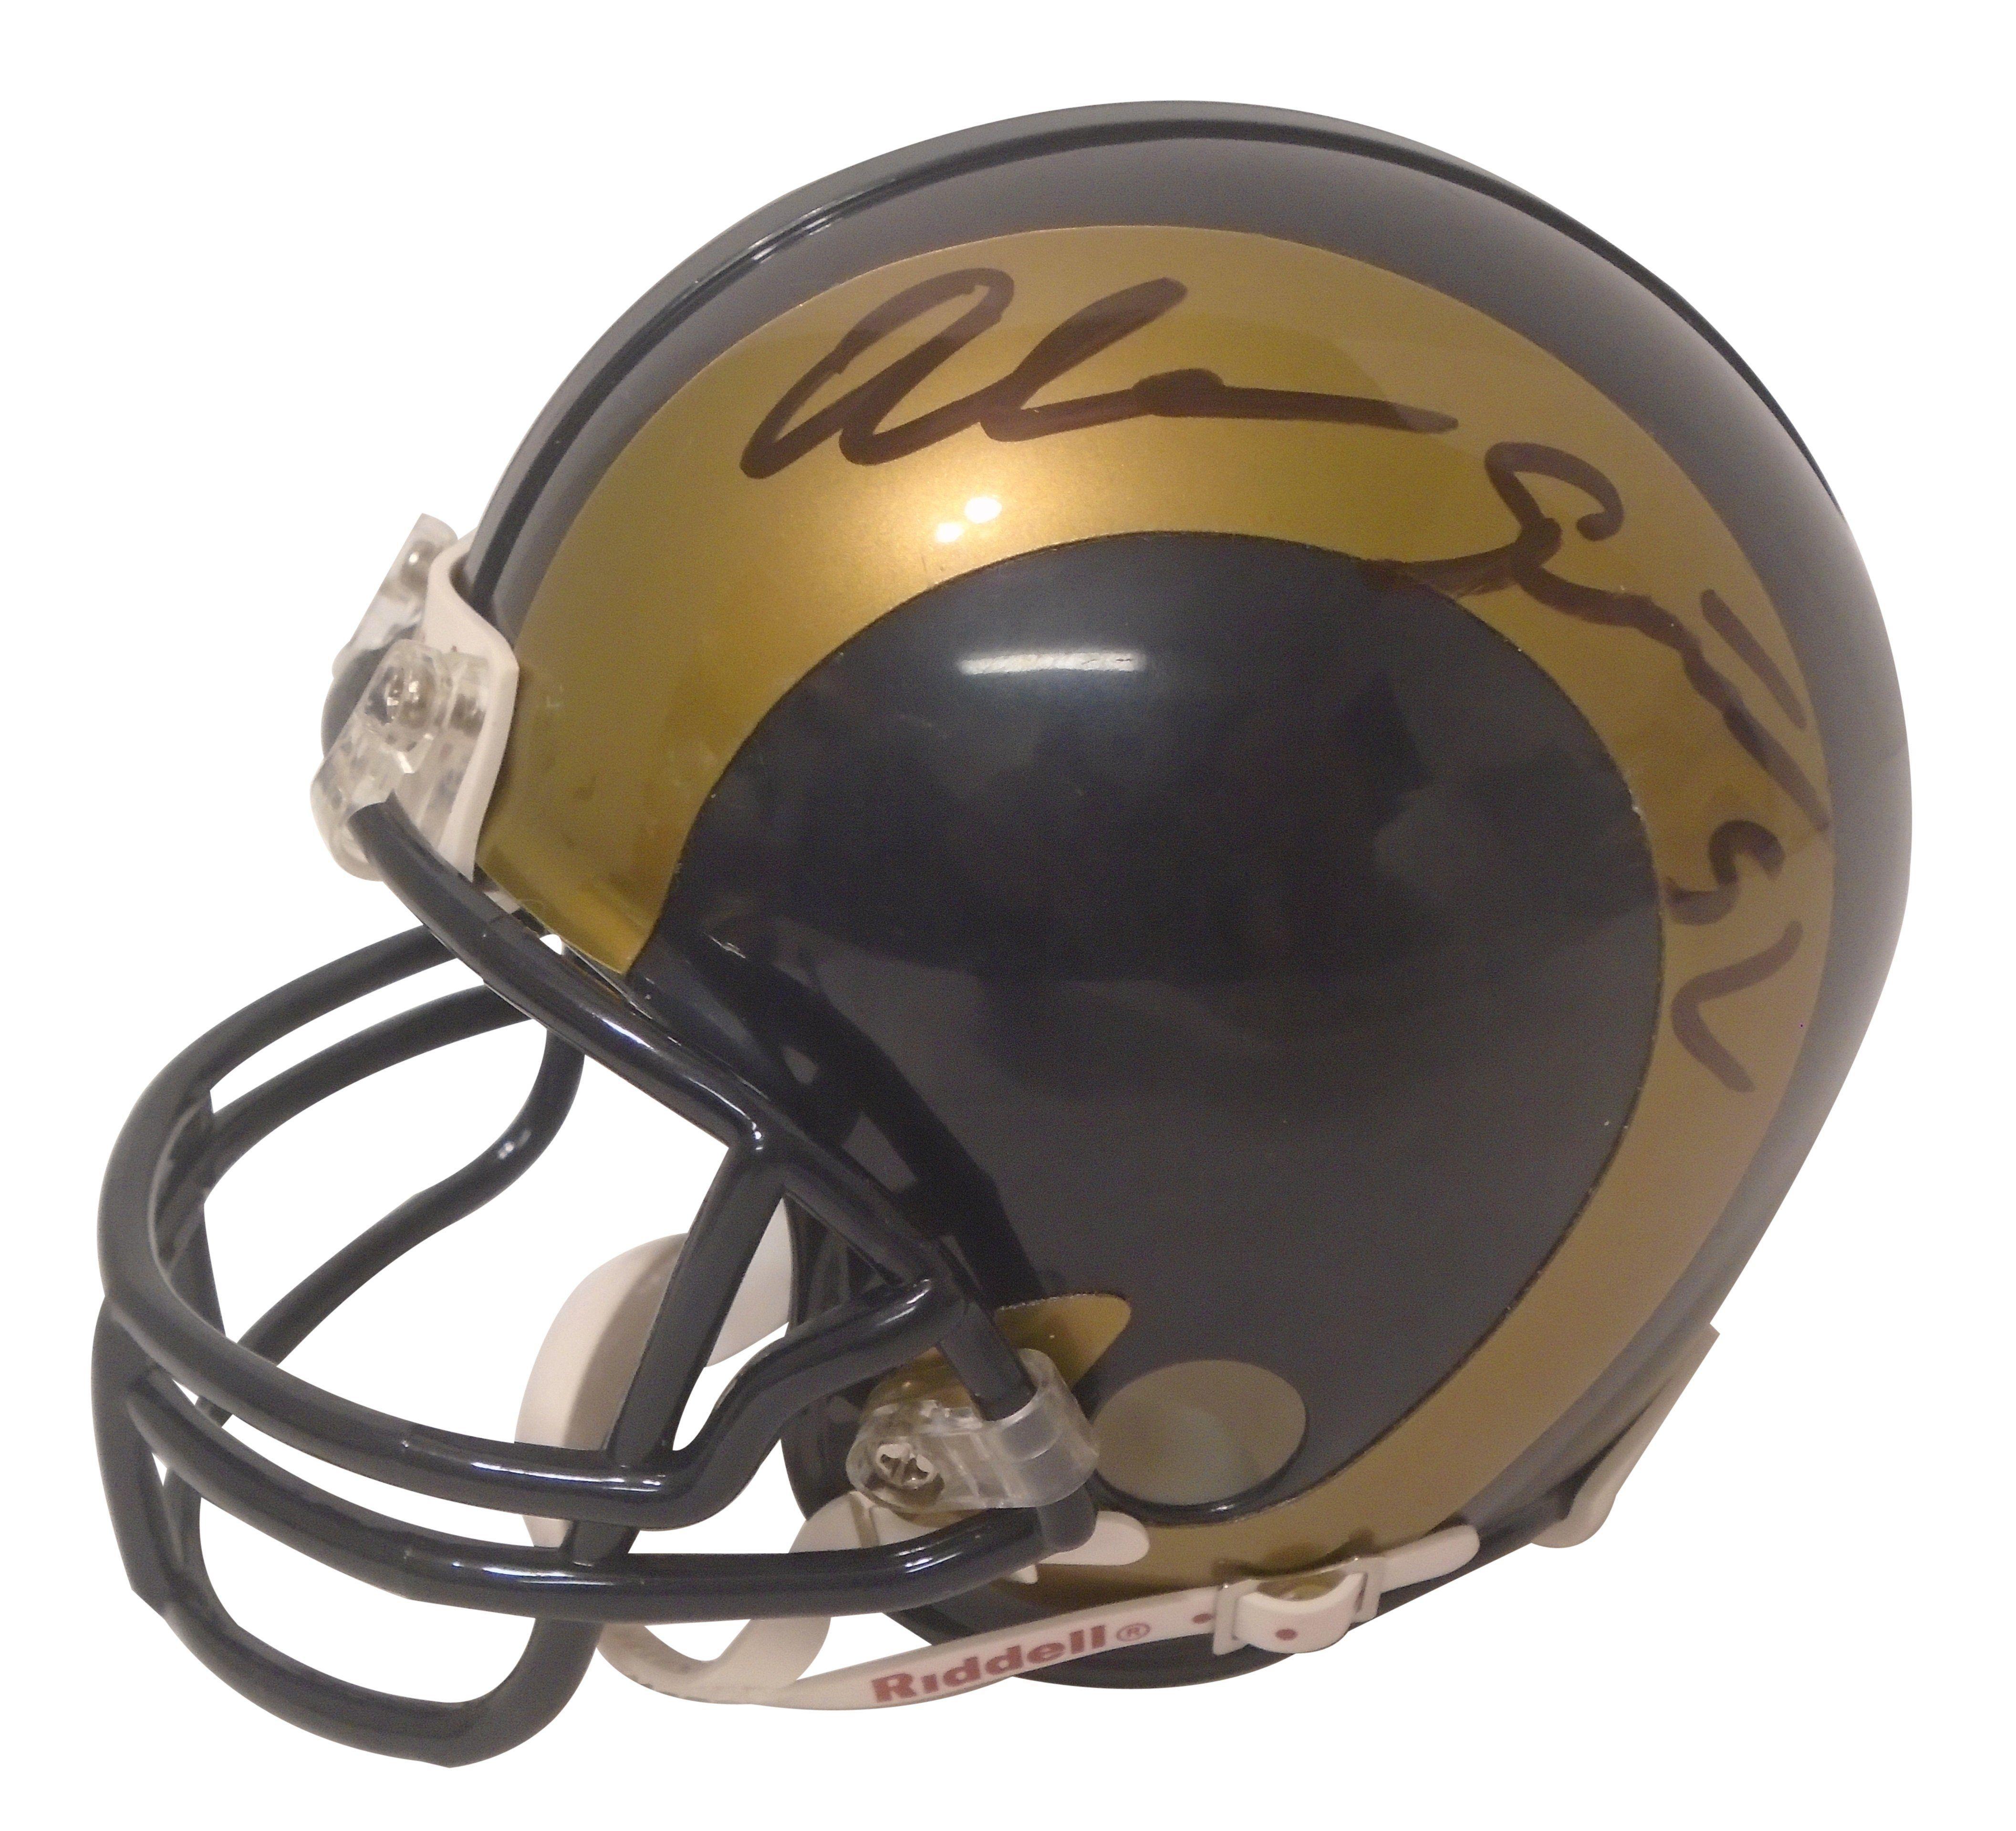 Alec Ogletree Autographed Los Angeles Rams Logo Riddell